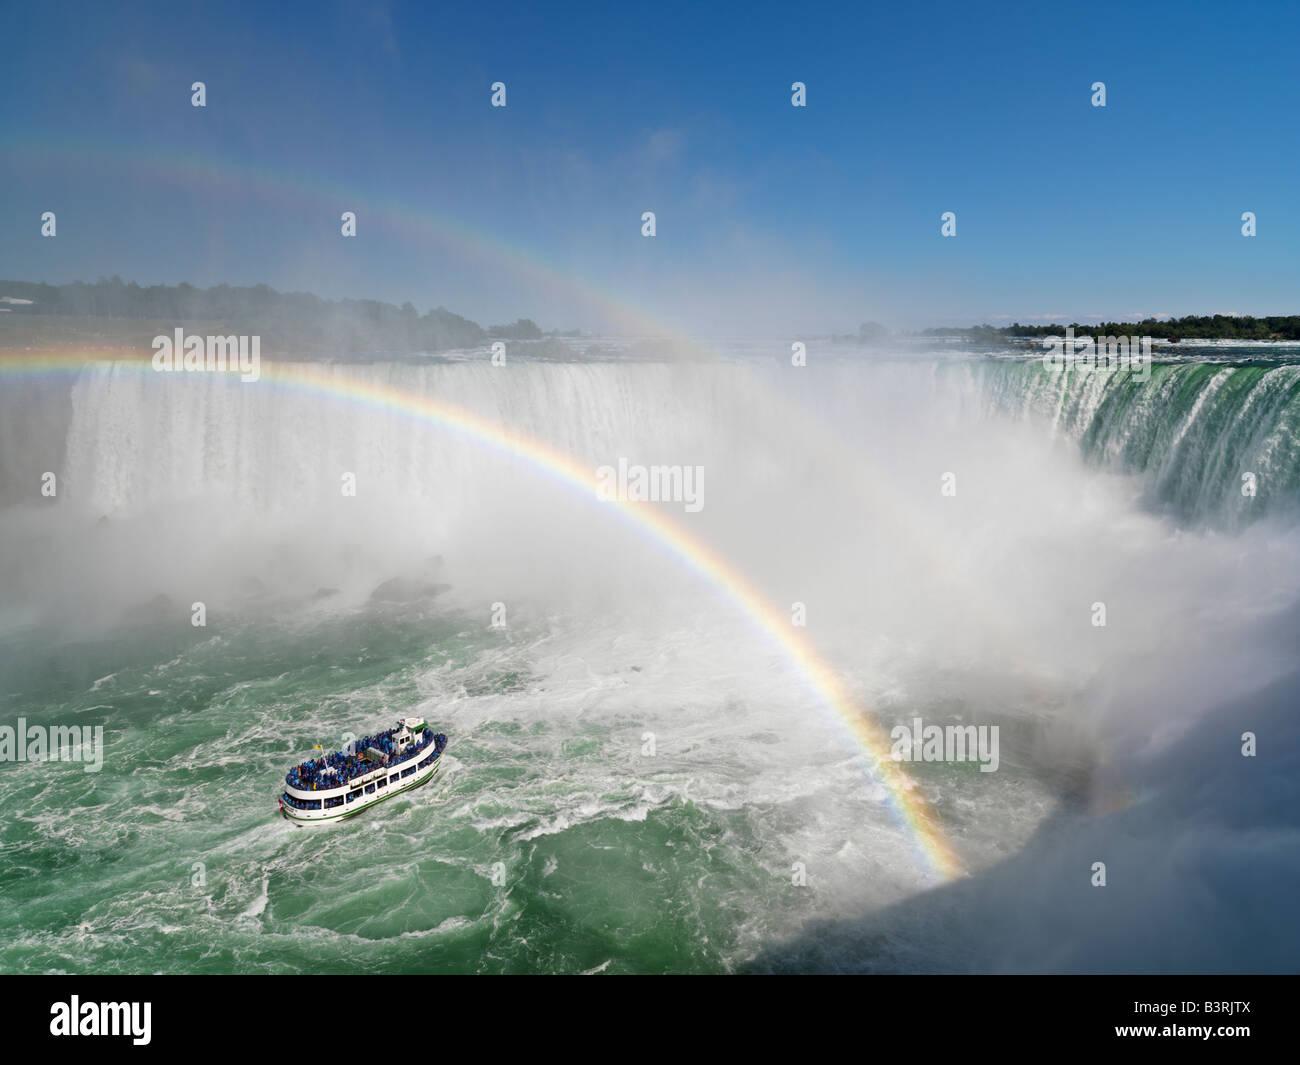 Kanada, Ontario, Niagarafälle, Mädchen der Nebel Tour Boot nähert sich die kanadischen Wasserfälle Stockbild